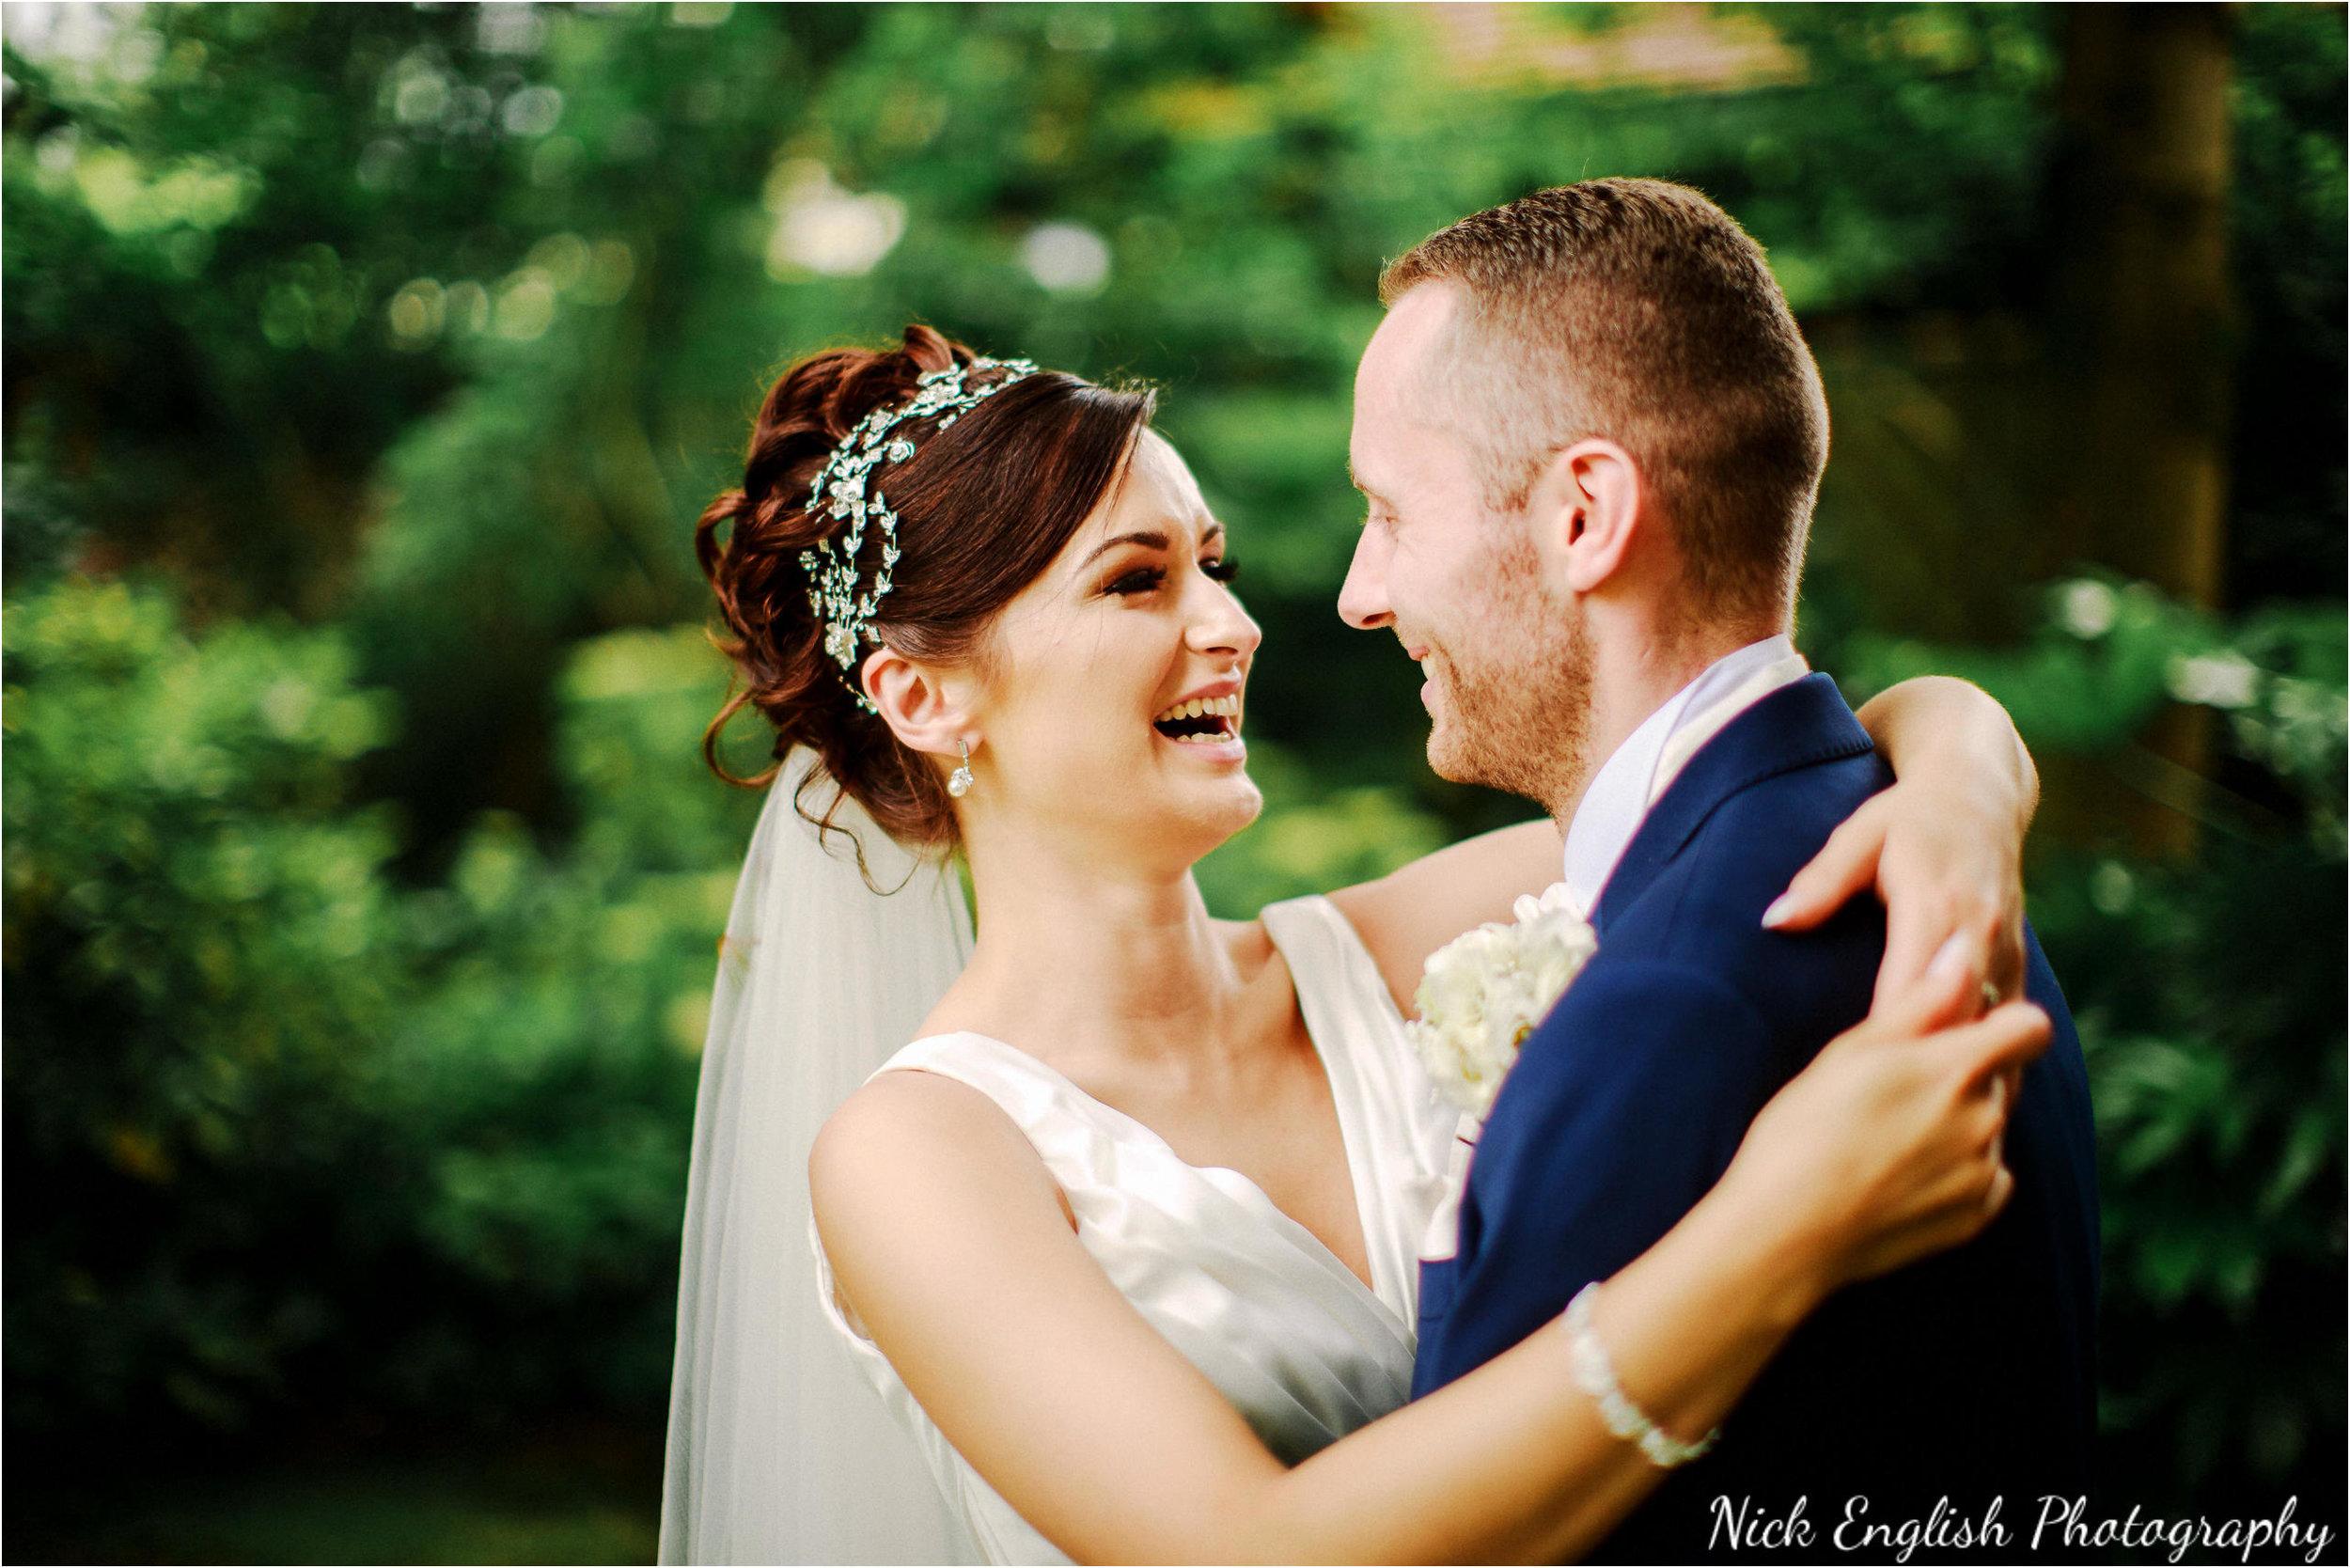 Emily David Wedding Photographs at Barton Grange Preston by Nick English Photography 122jpg.jpeg